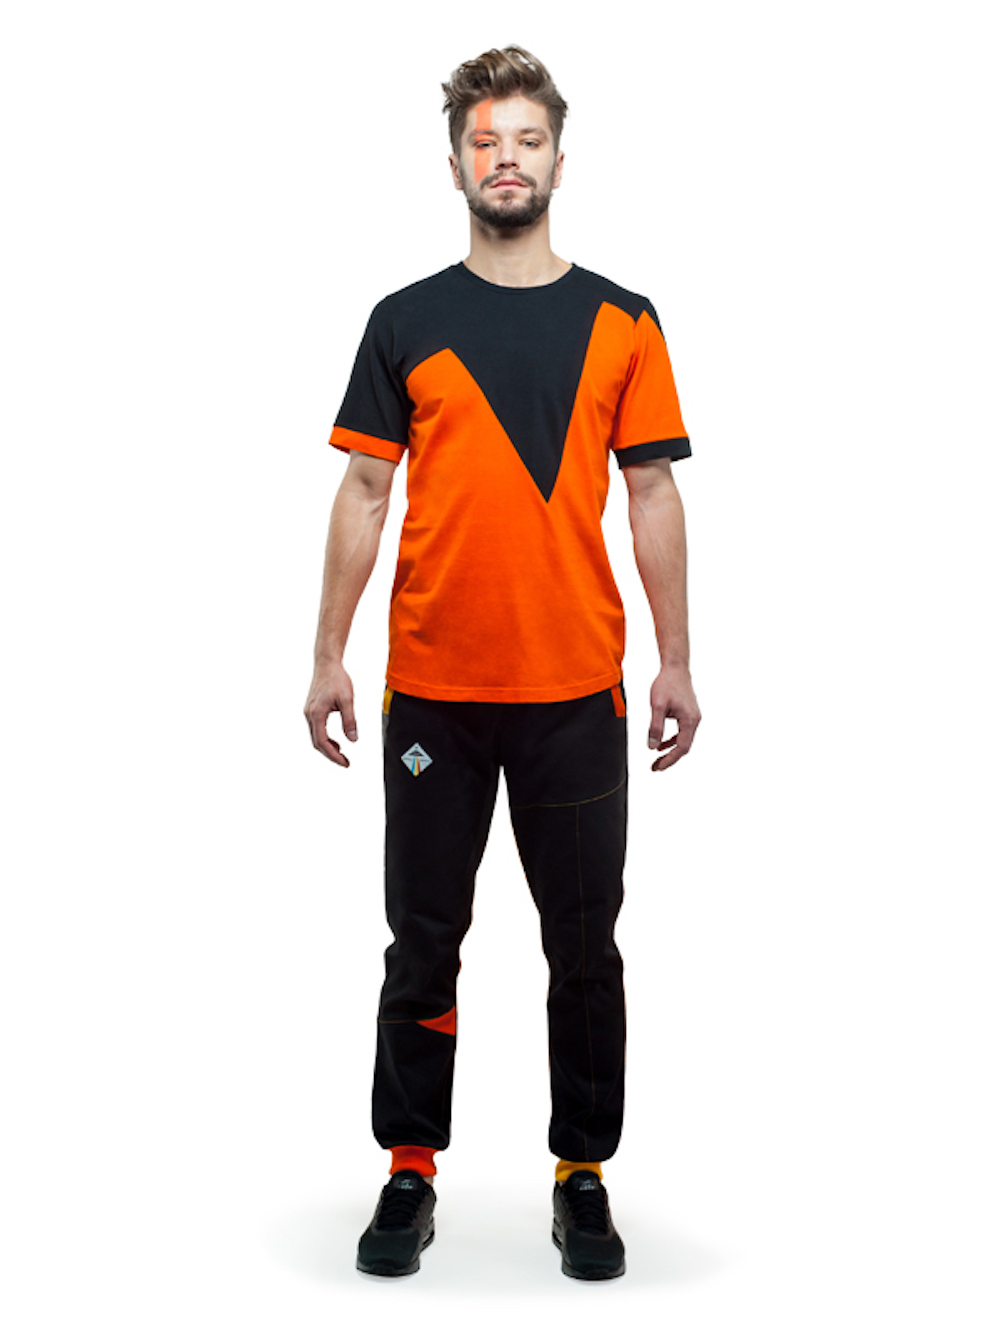 Orion T-shirt (Orange) - Okuaku